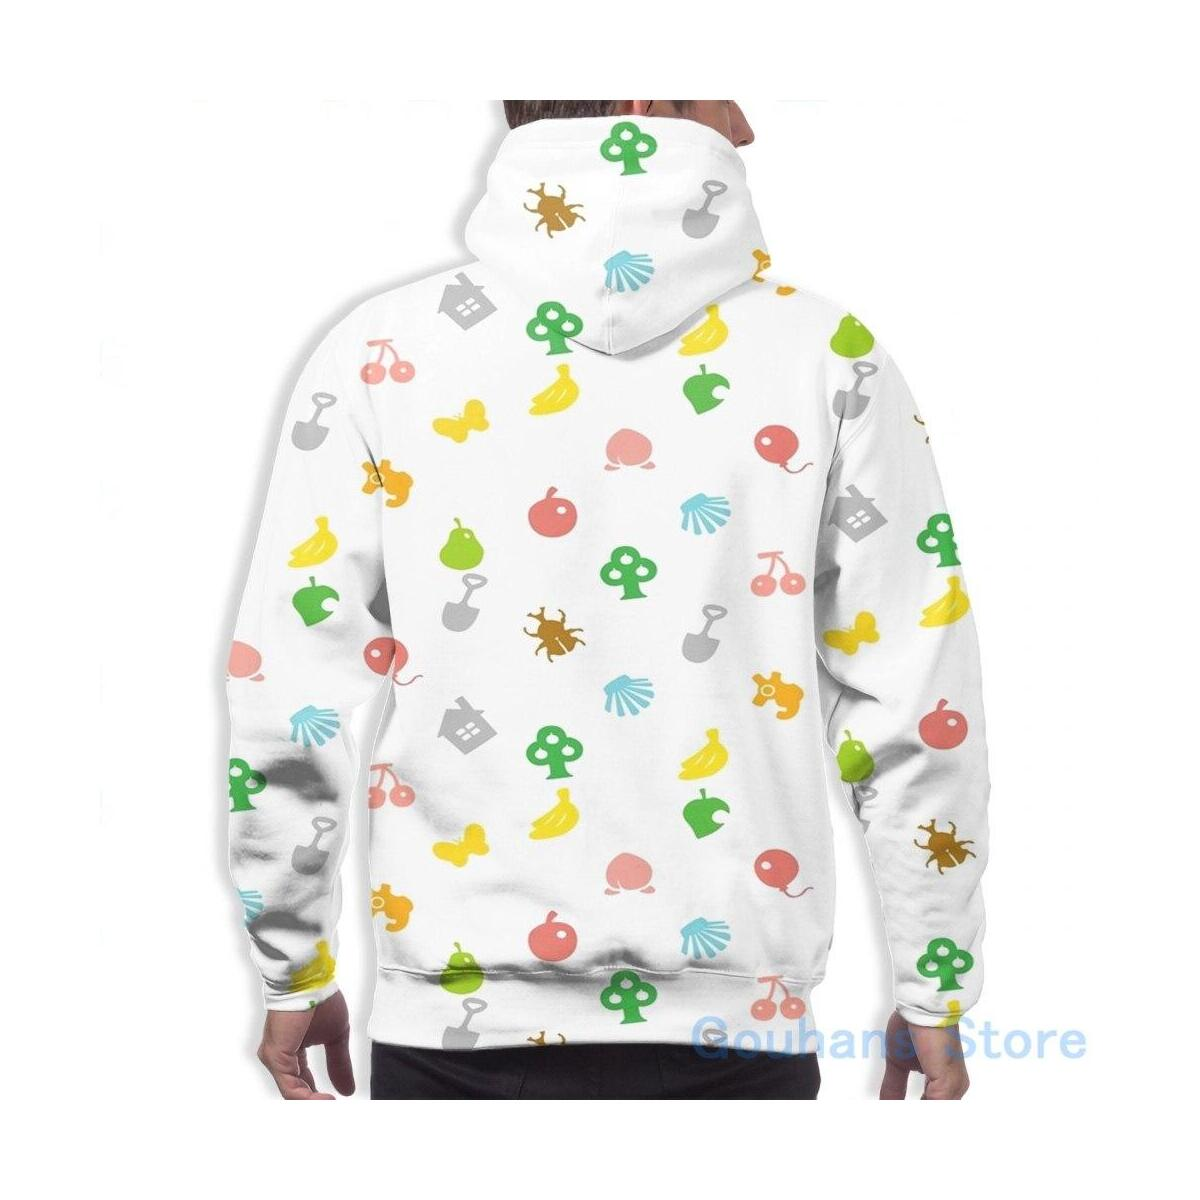 Animal Crossing New Horizons Icon Patterned Hoodie, Men / M